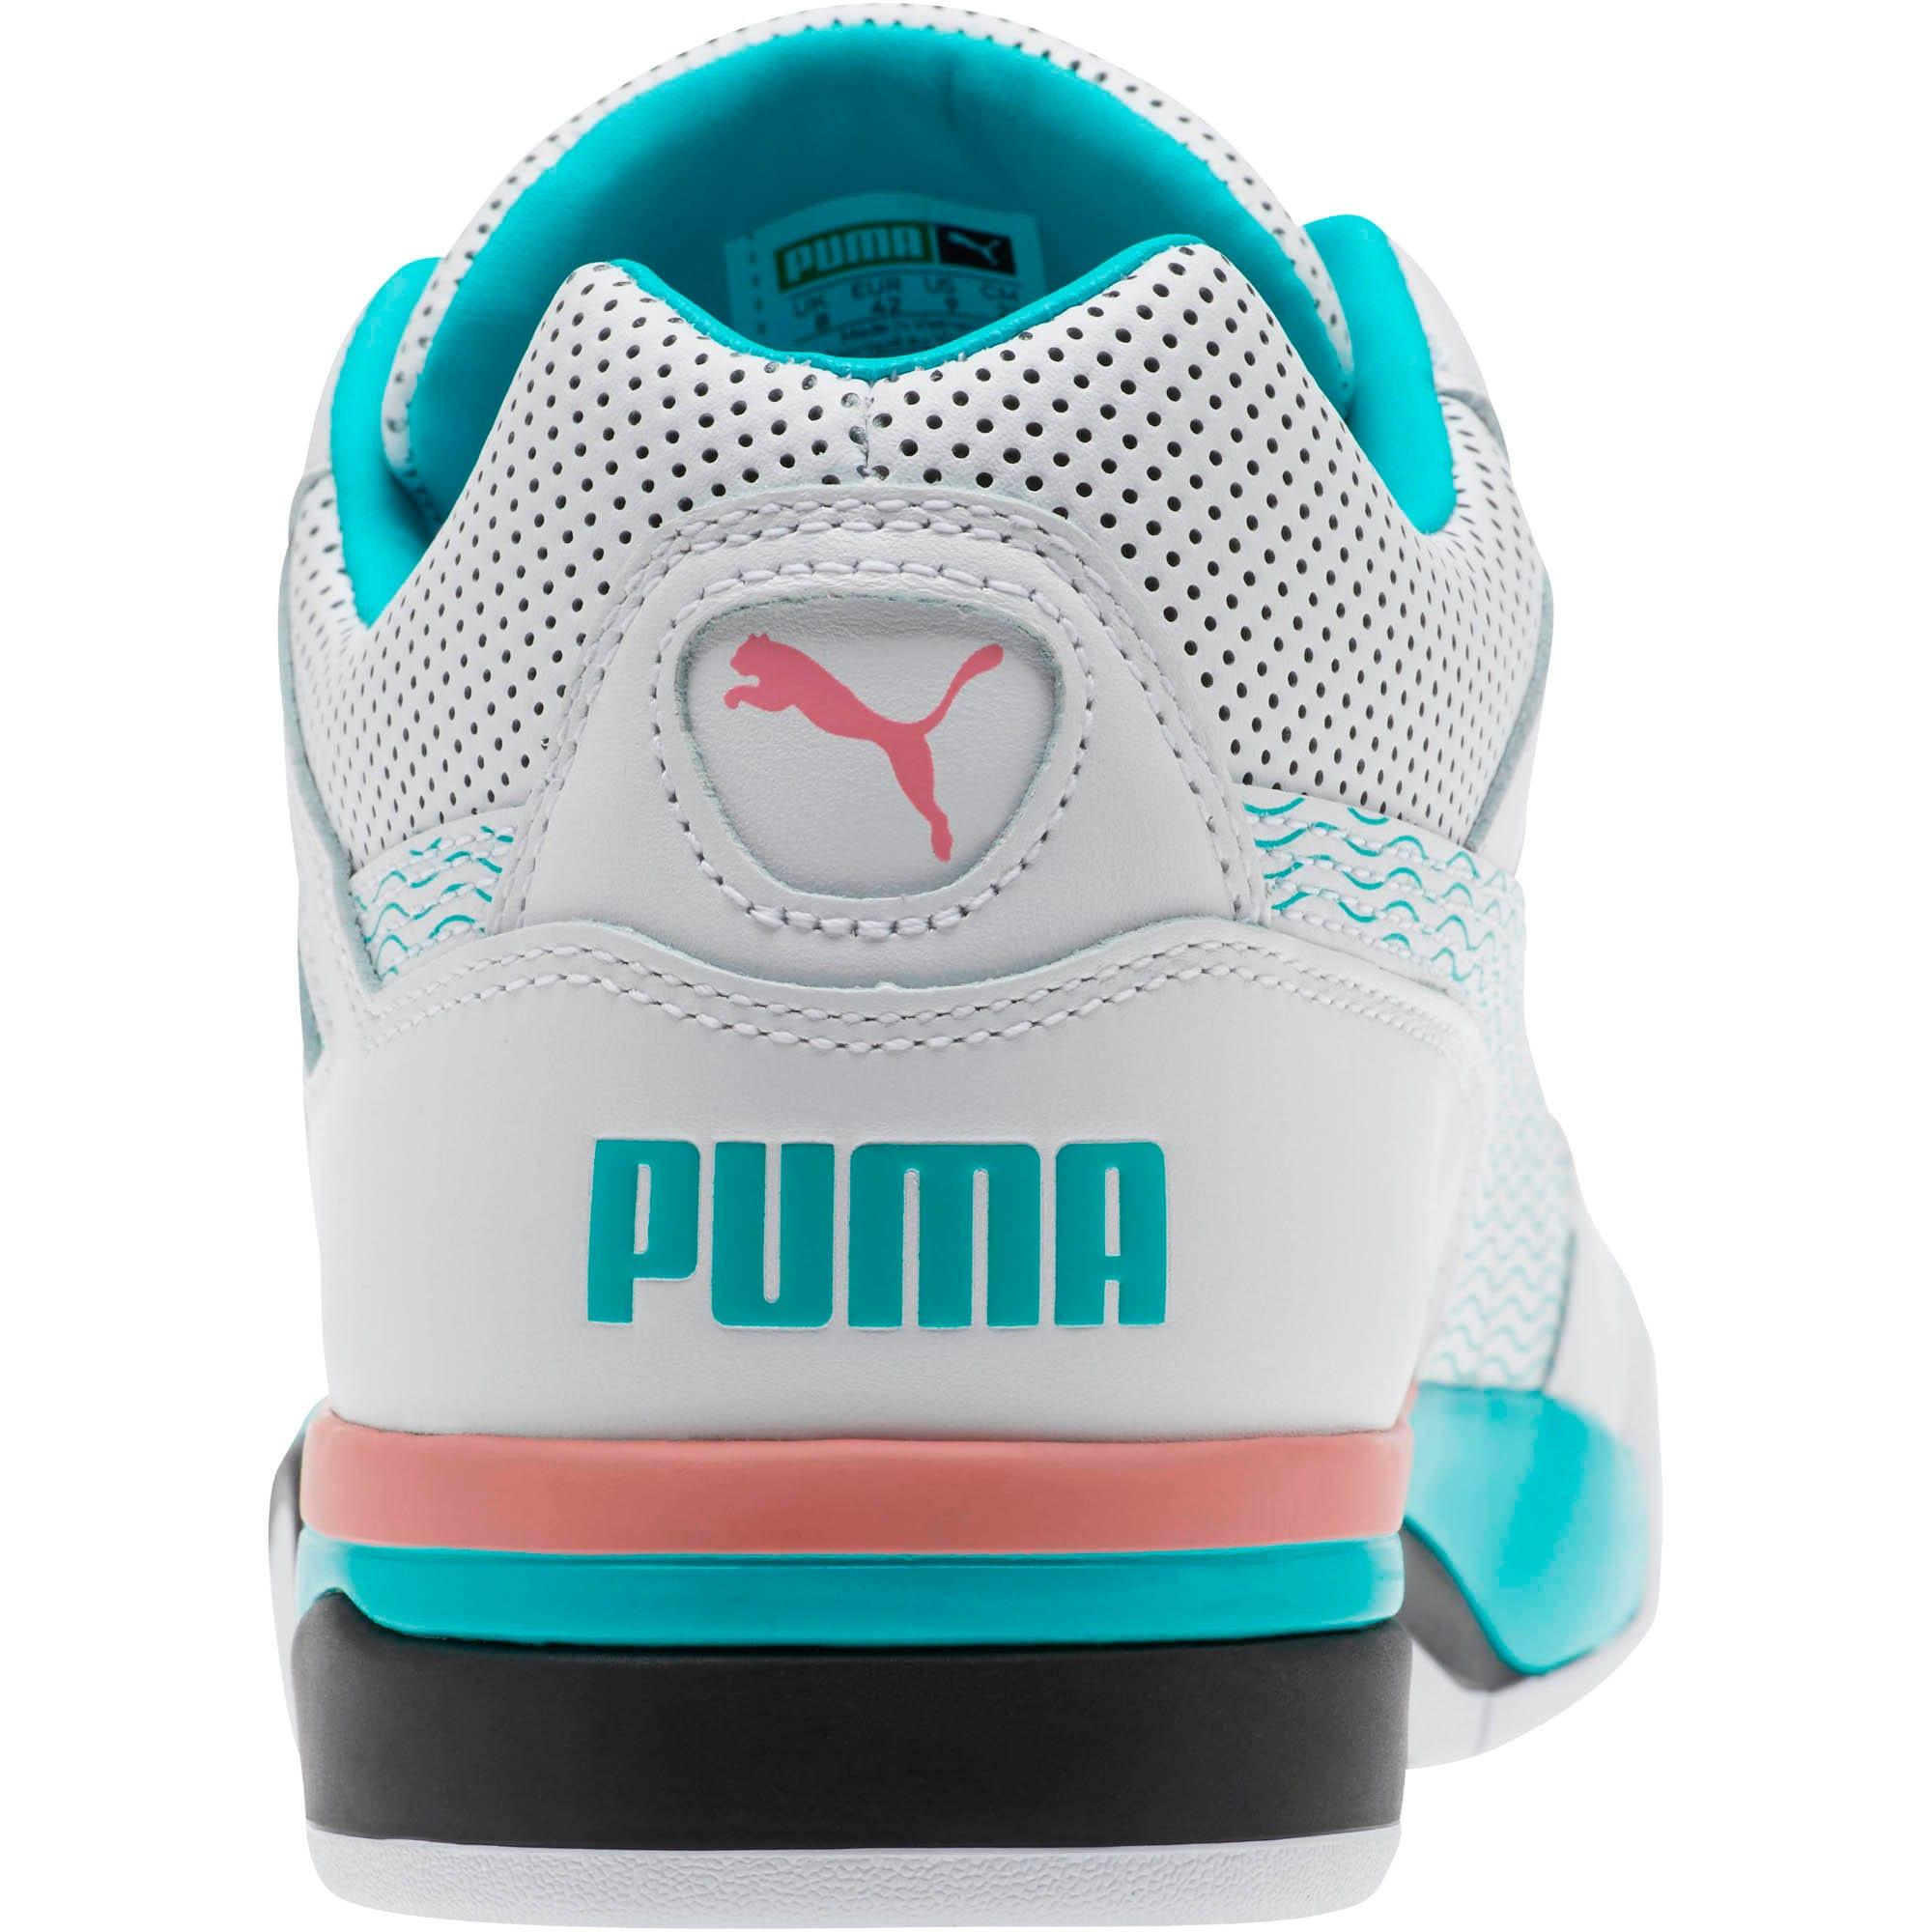 Thumbnail 3 of Palace Guard Last Dayz Men's Sneakers, Puma White-Geranium, medium